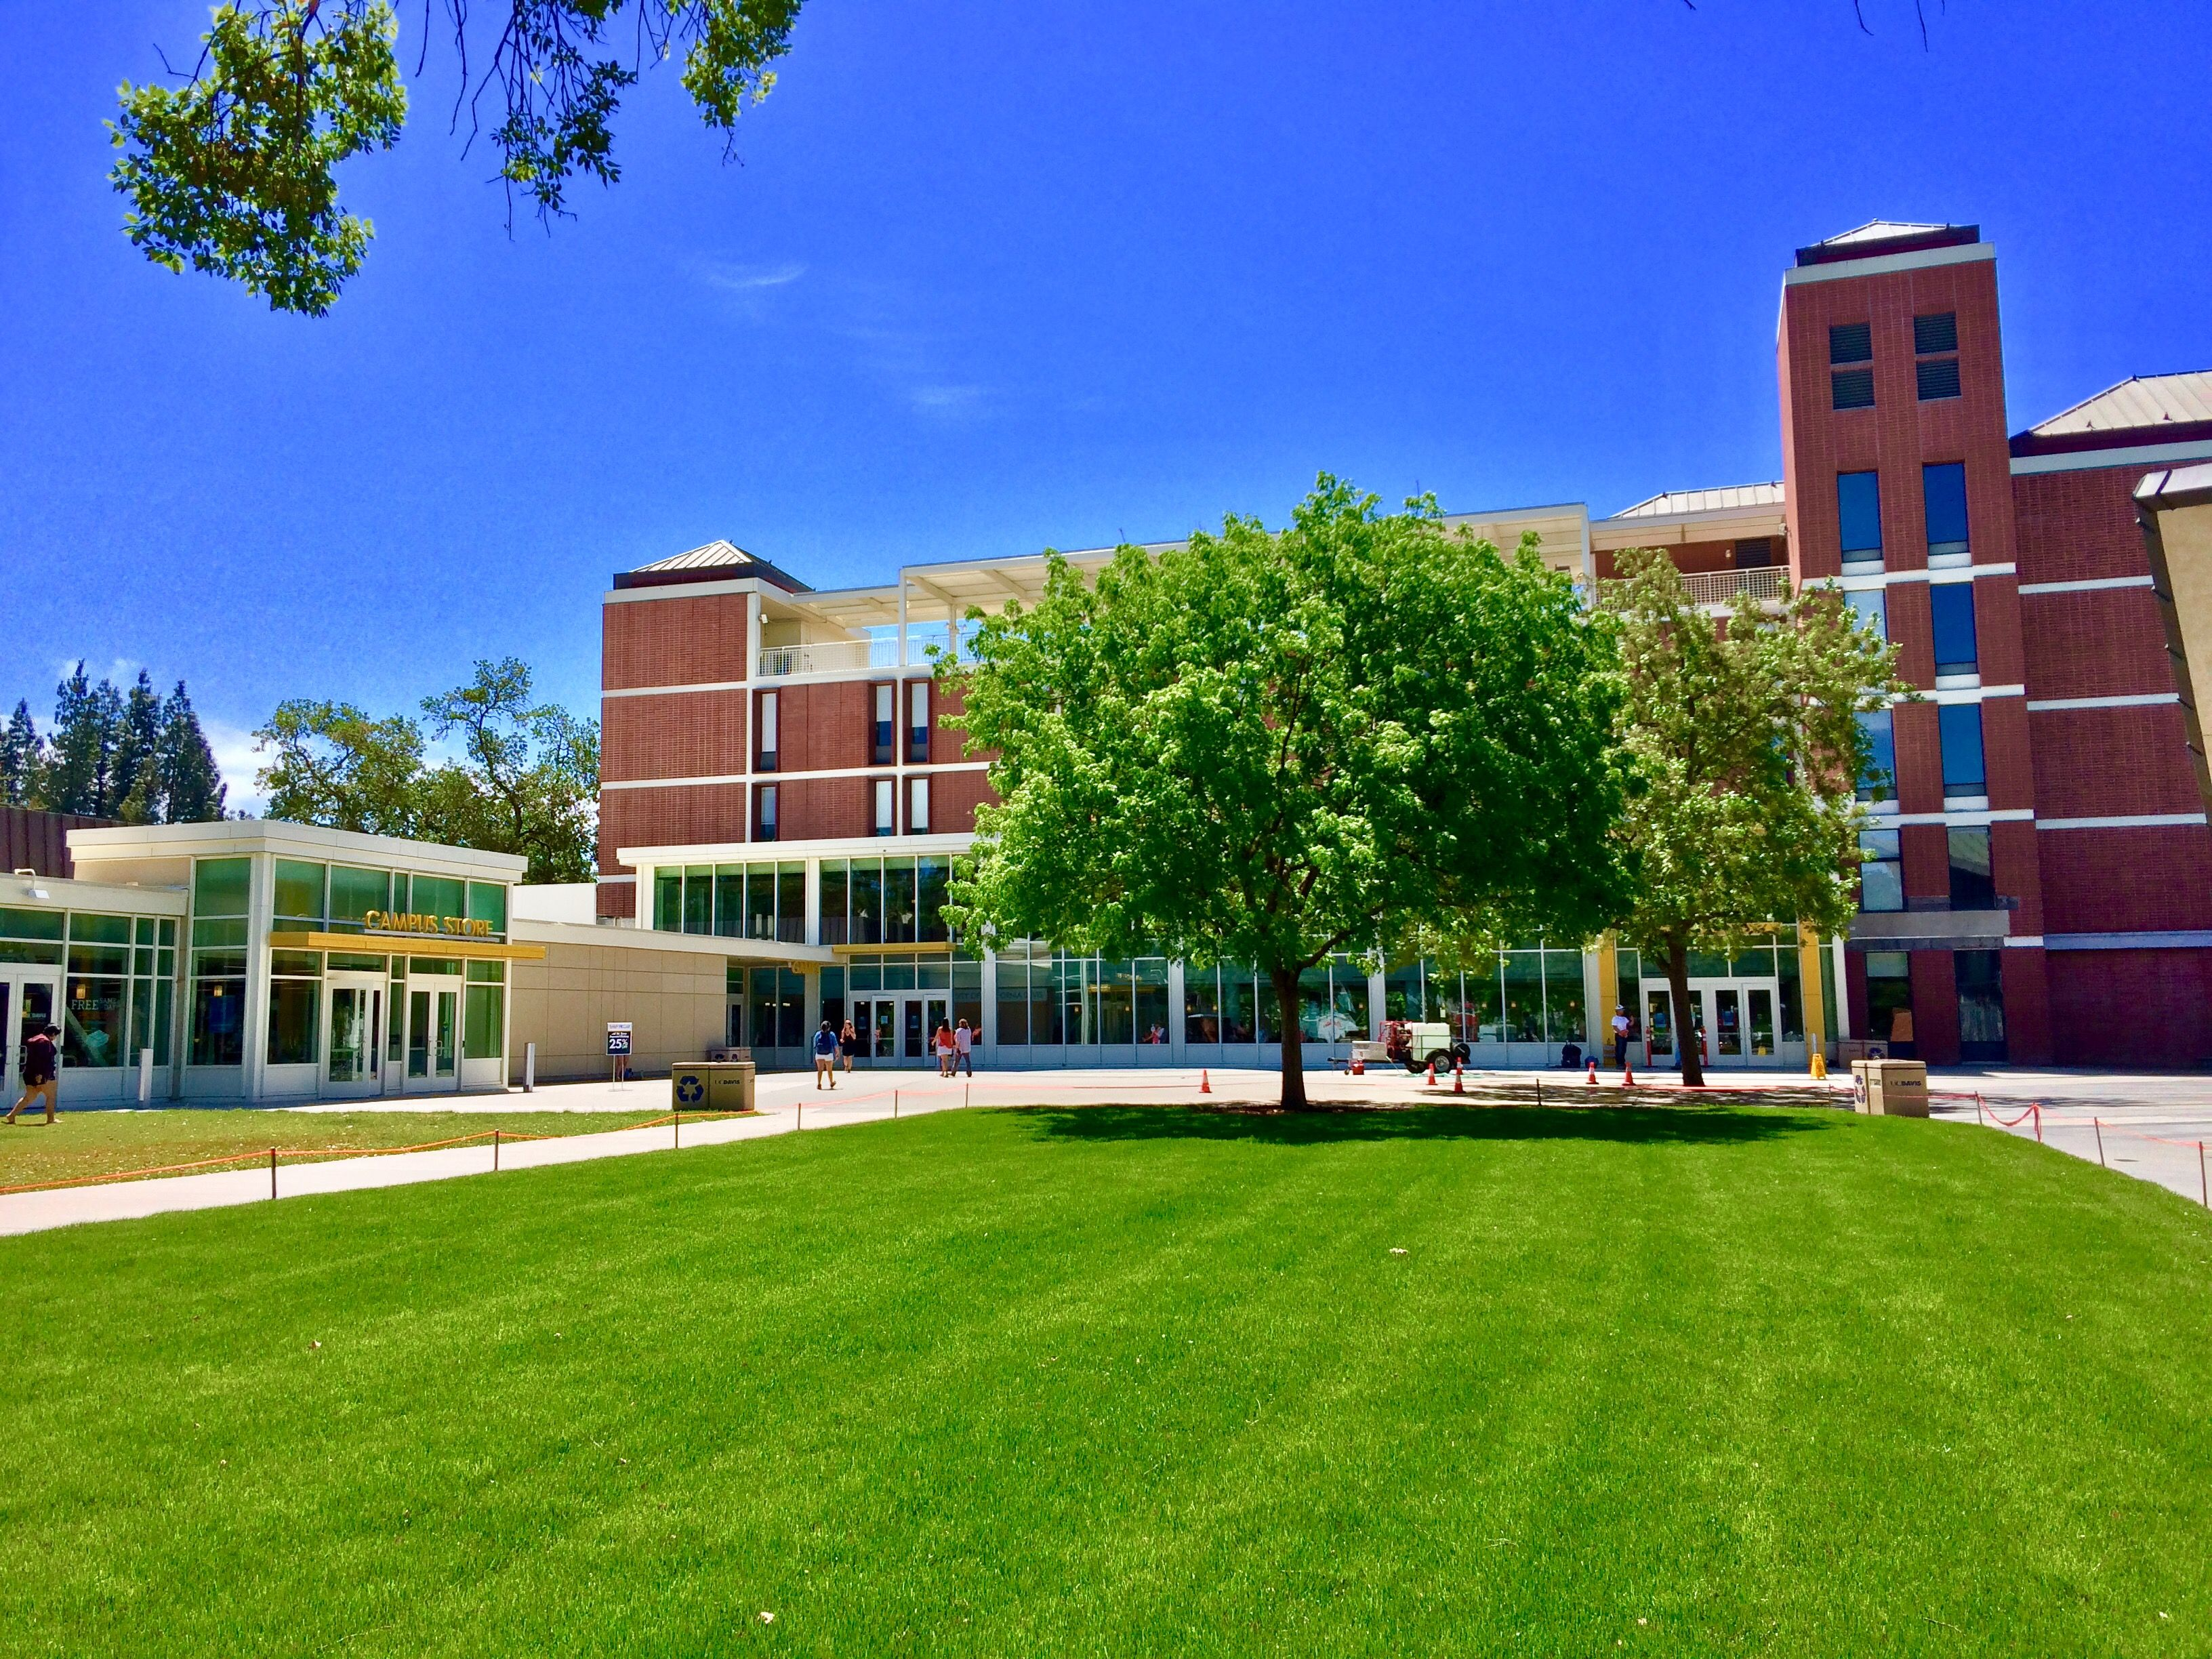 University of California Davis Memorial Union   University